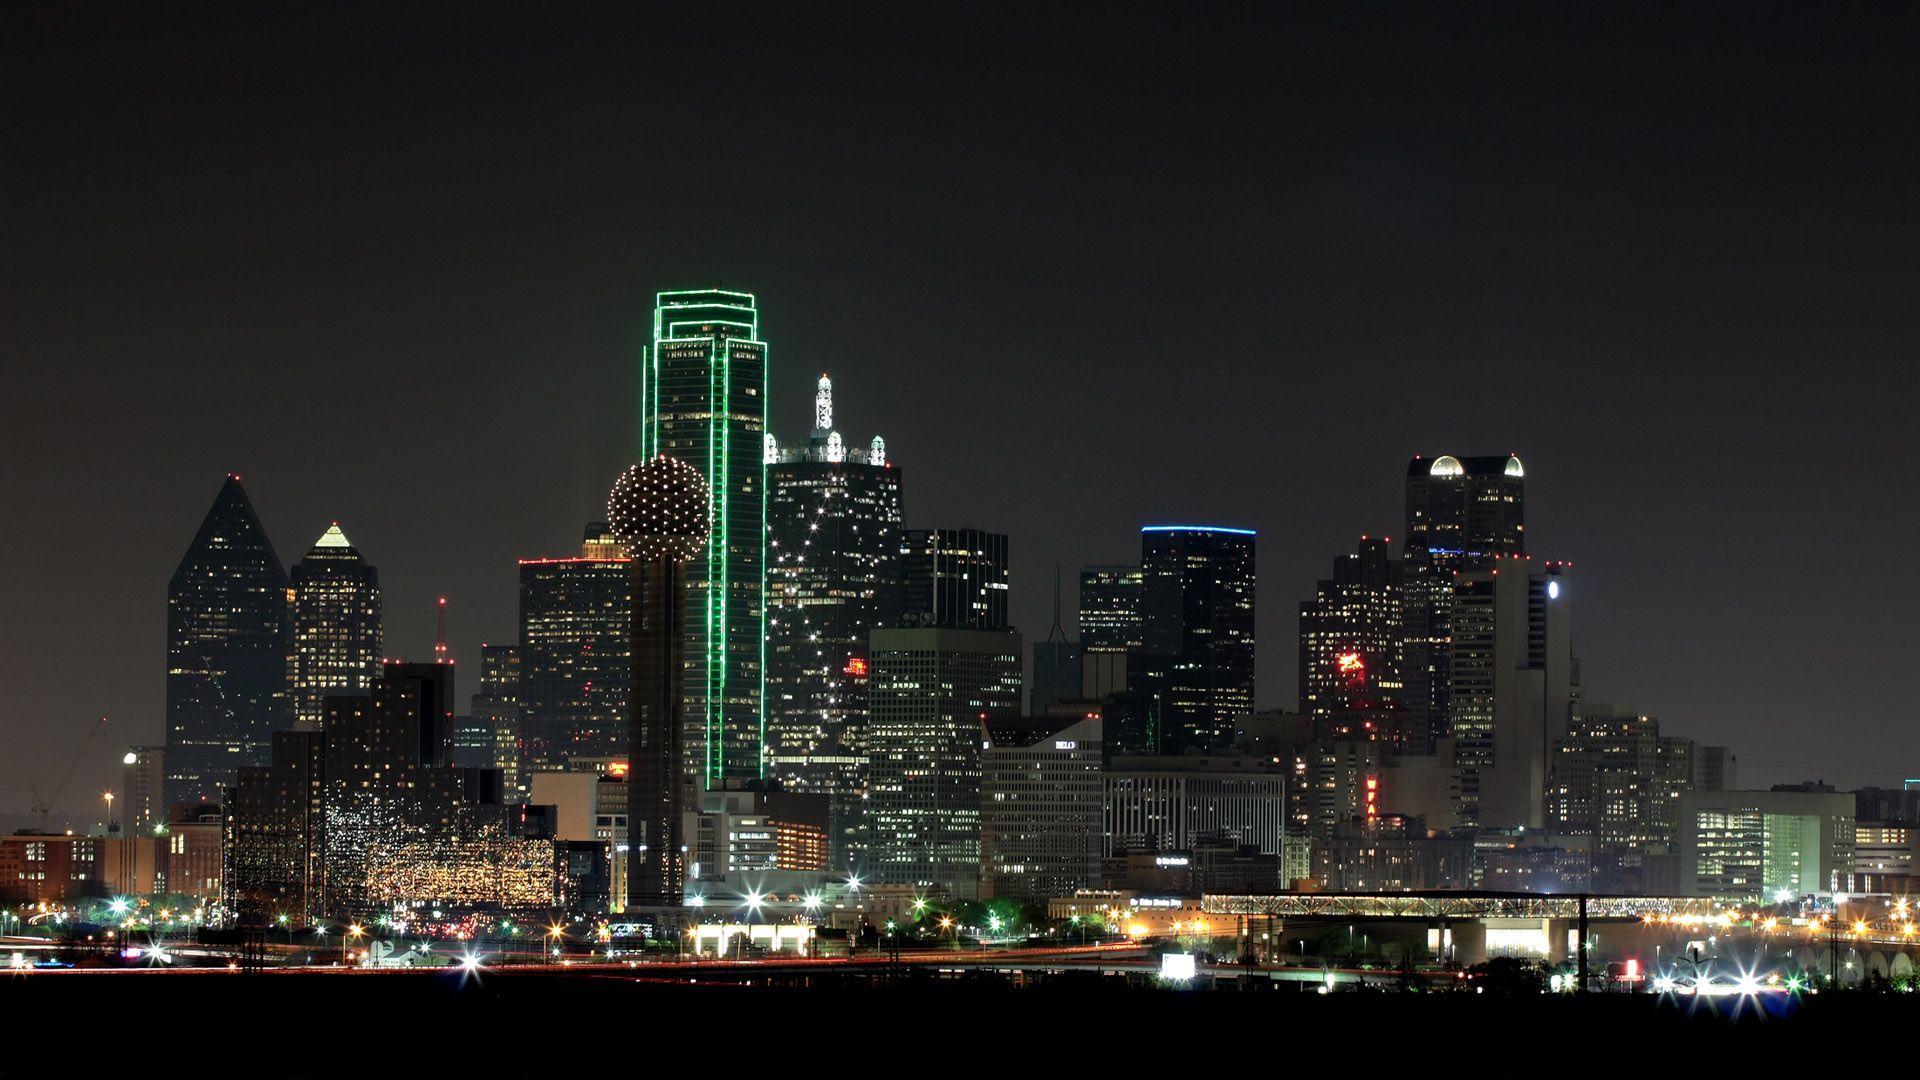 dallas skyline wallpaper  Dallas Skyline Wallpapers - Wallpaper Cave